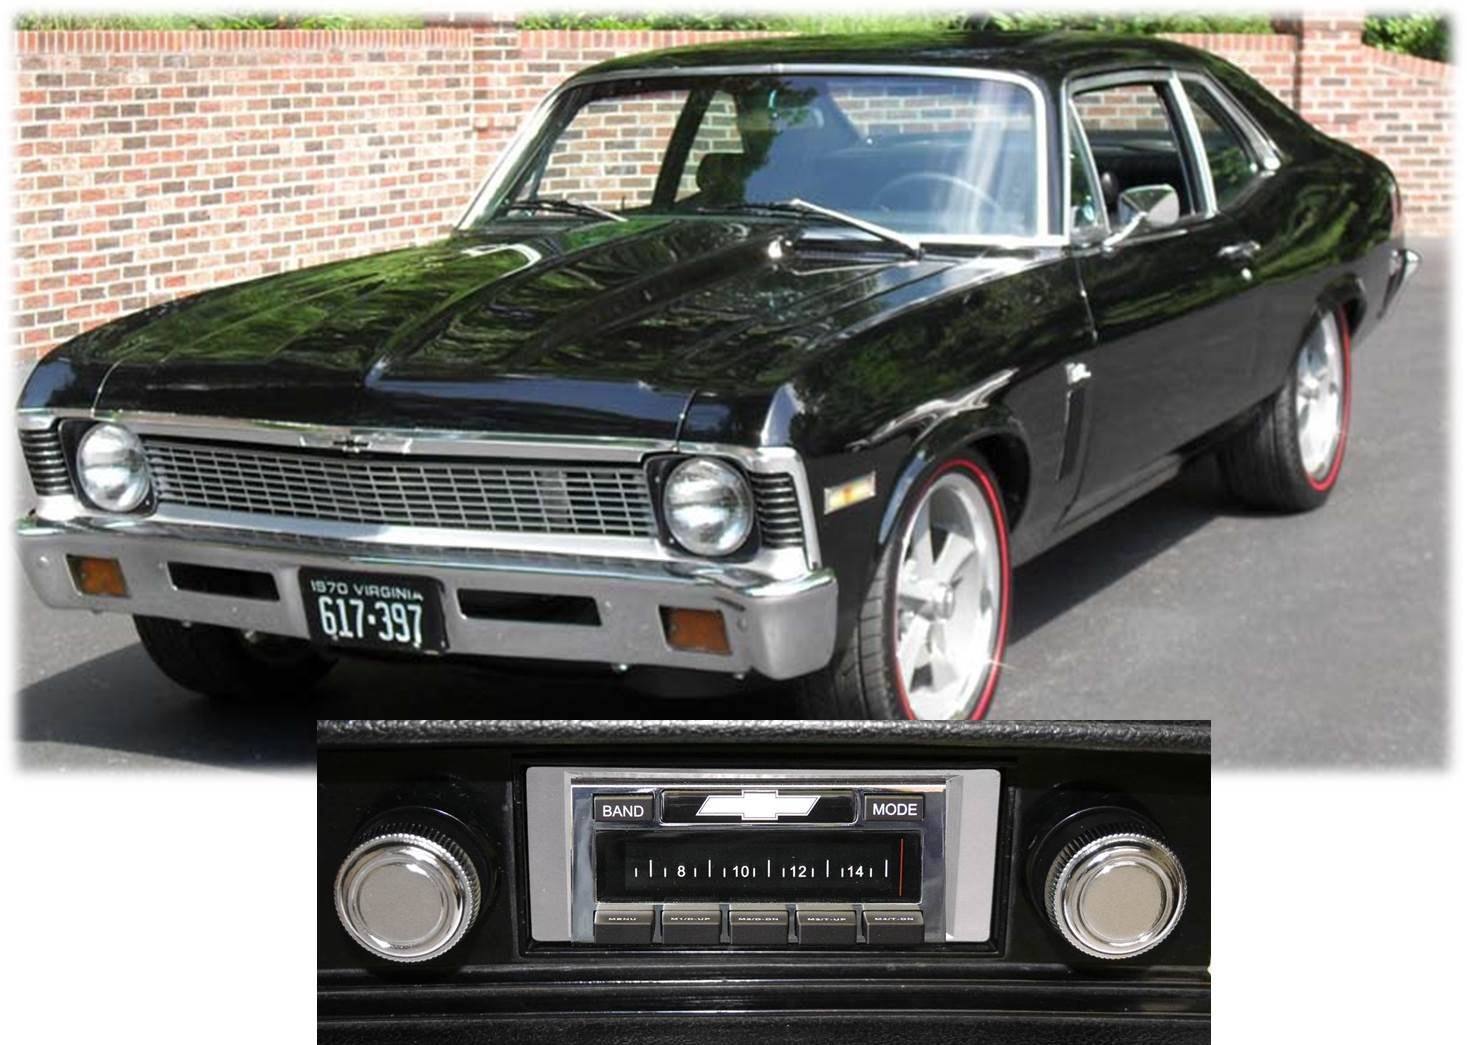 1968-1976 Chevy Nova USA-630 II High Power 300 watt AM FM Car Stereo/Radio with iPod Docking Cable by Custom Autosound B00VF0AOQO